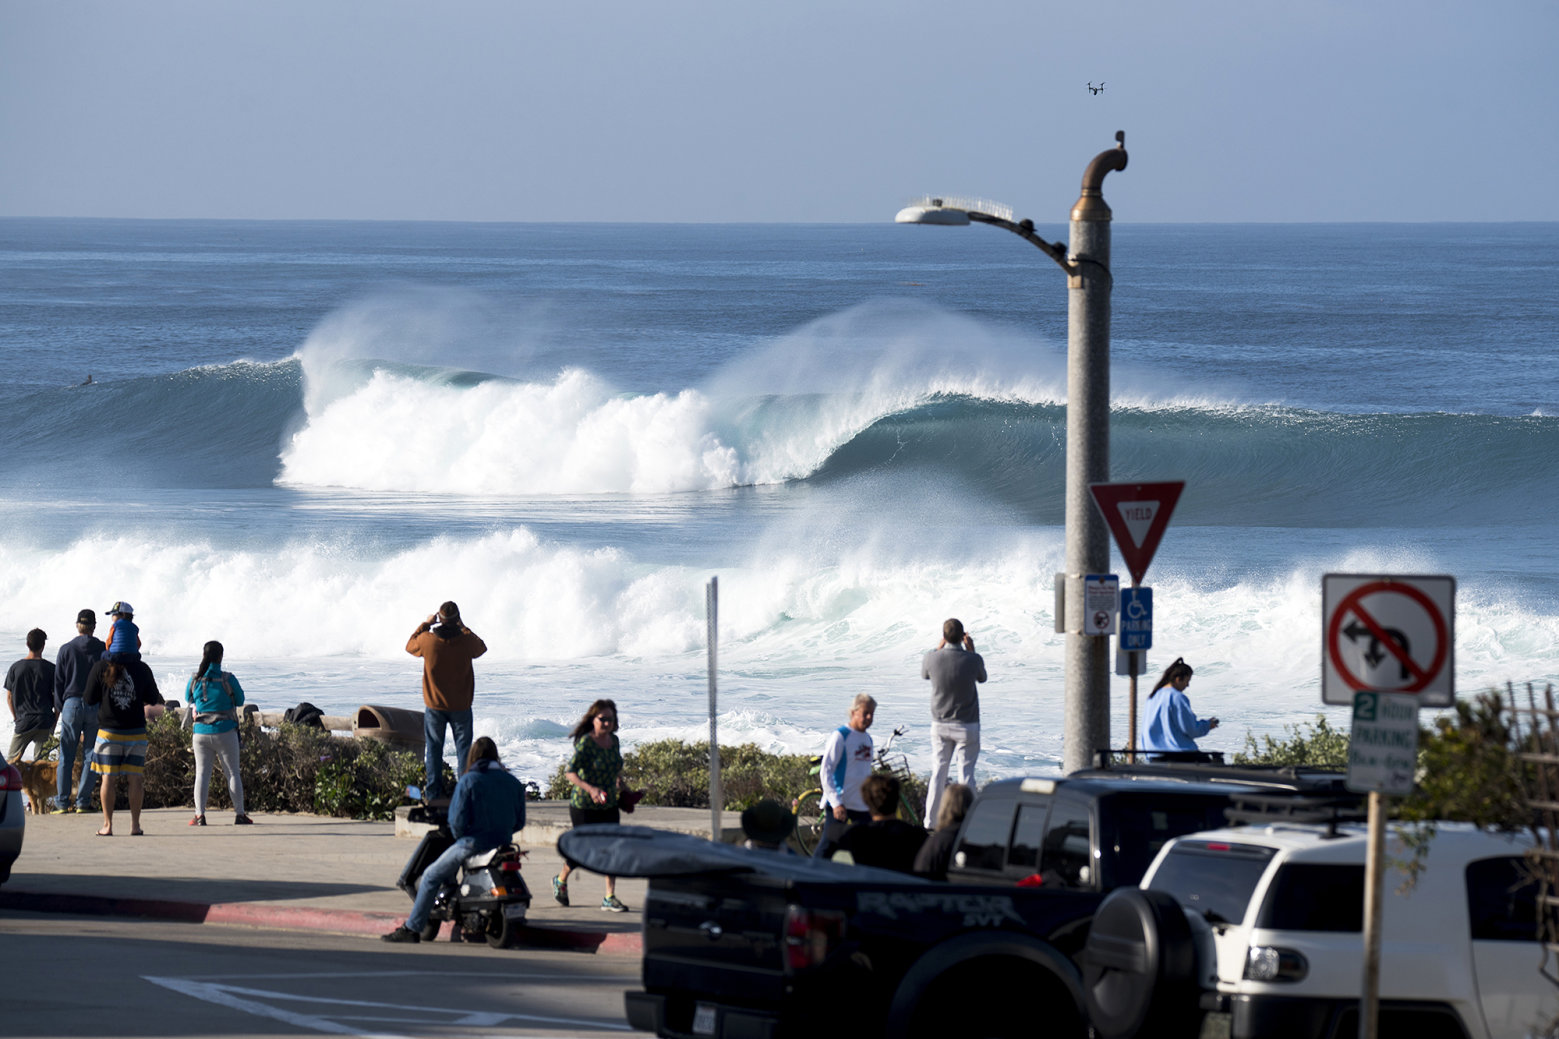 Weekend Video Forecast: Hawaii Takes a Break, Solid WNW Swell Slams West Coast